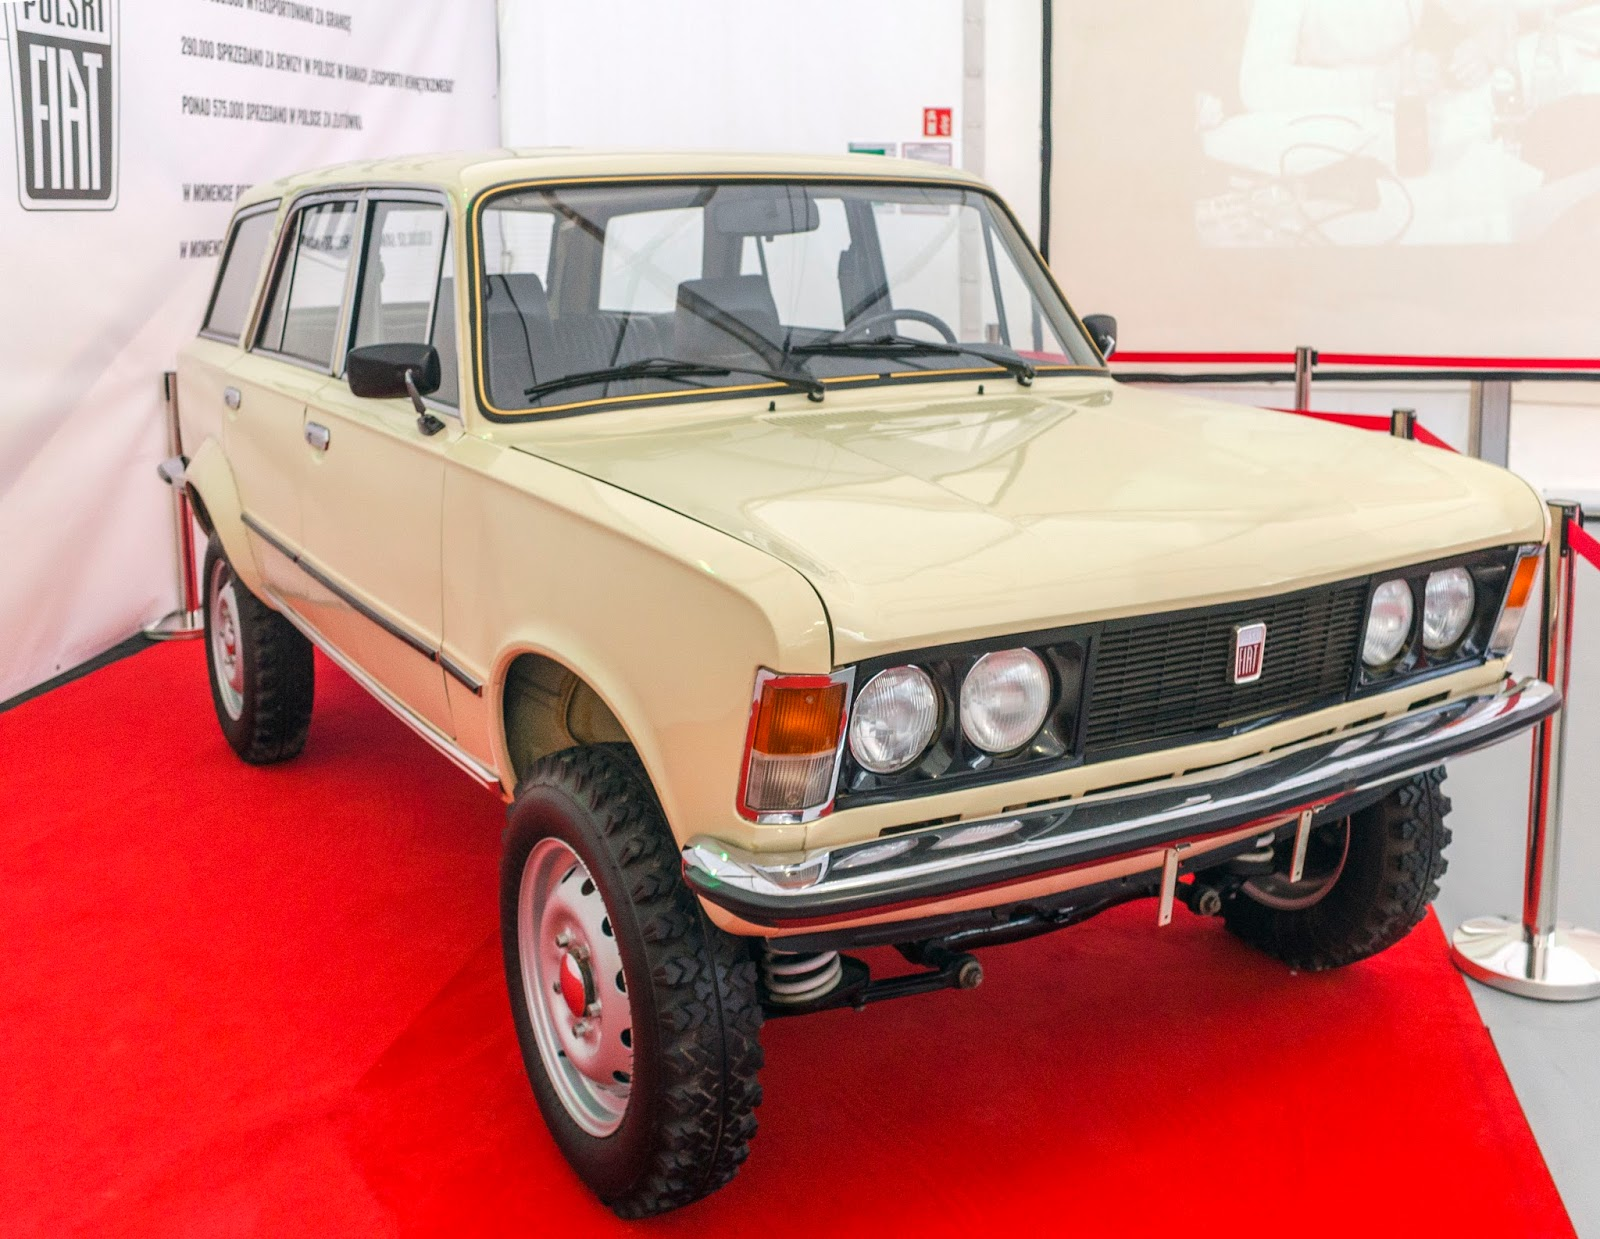 Wwa Jeziorki: 50th Anniversary of the Polski Fiat 125p